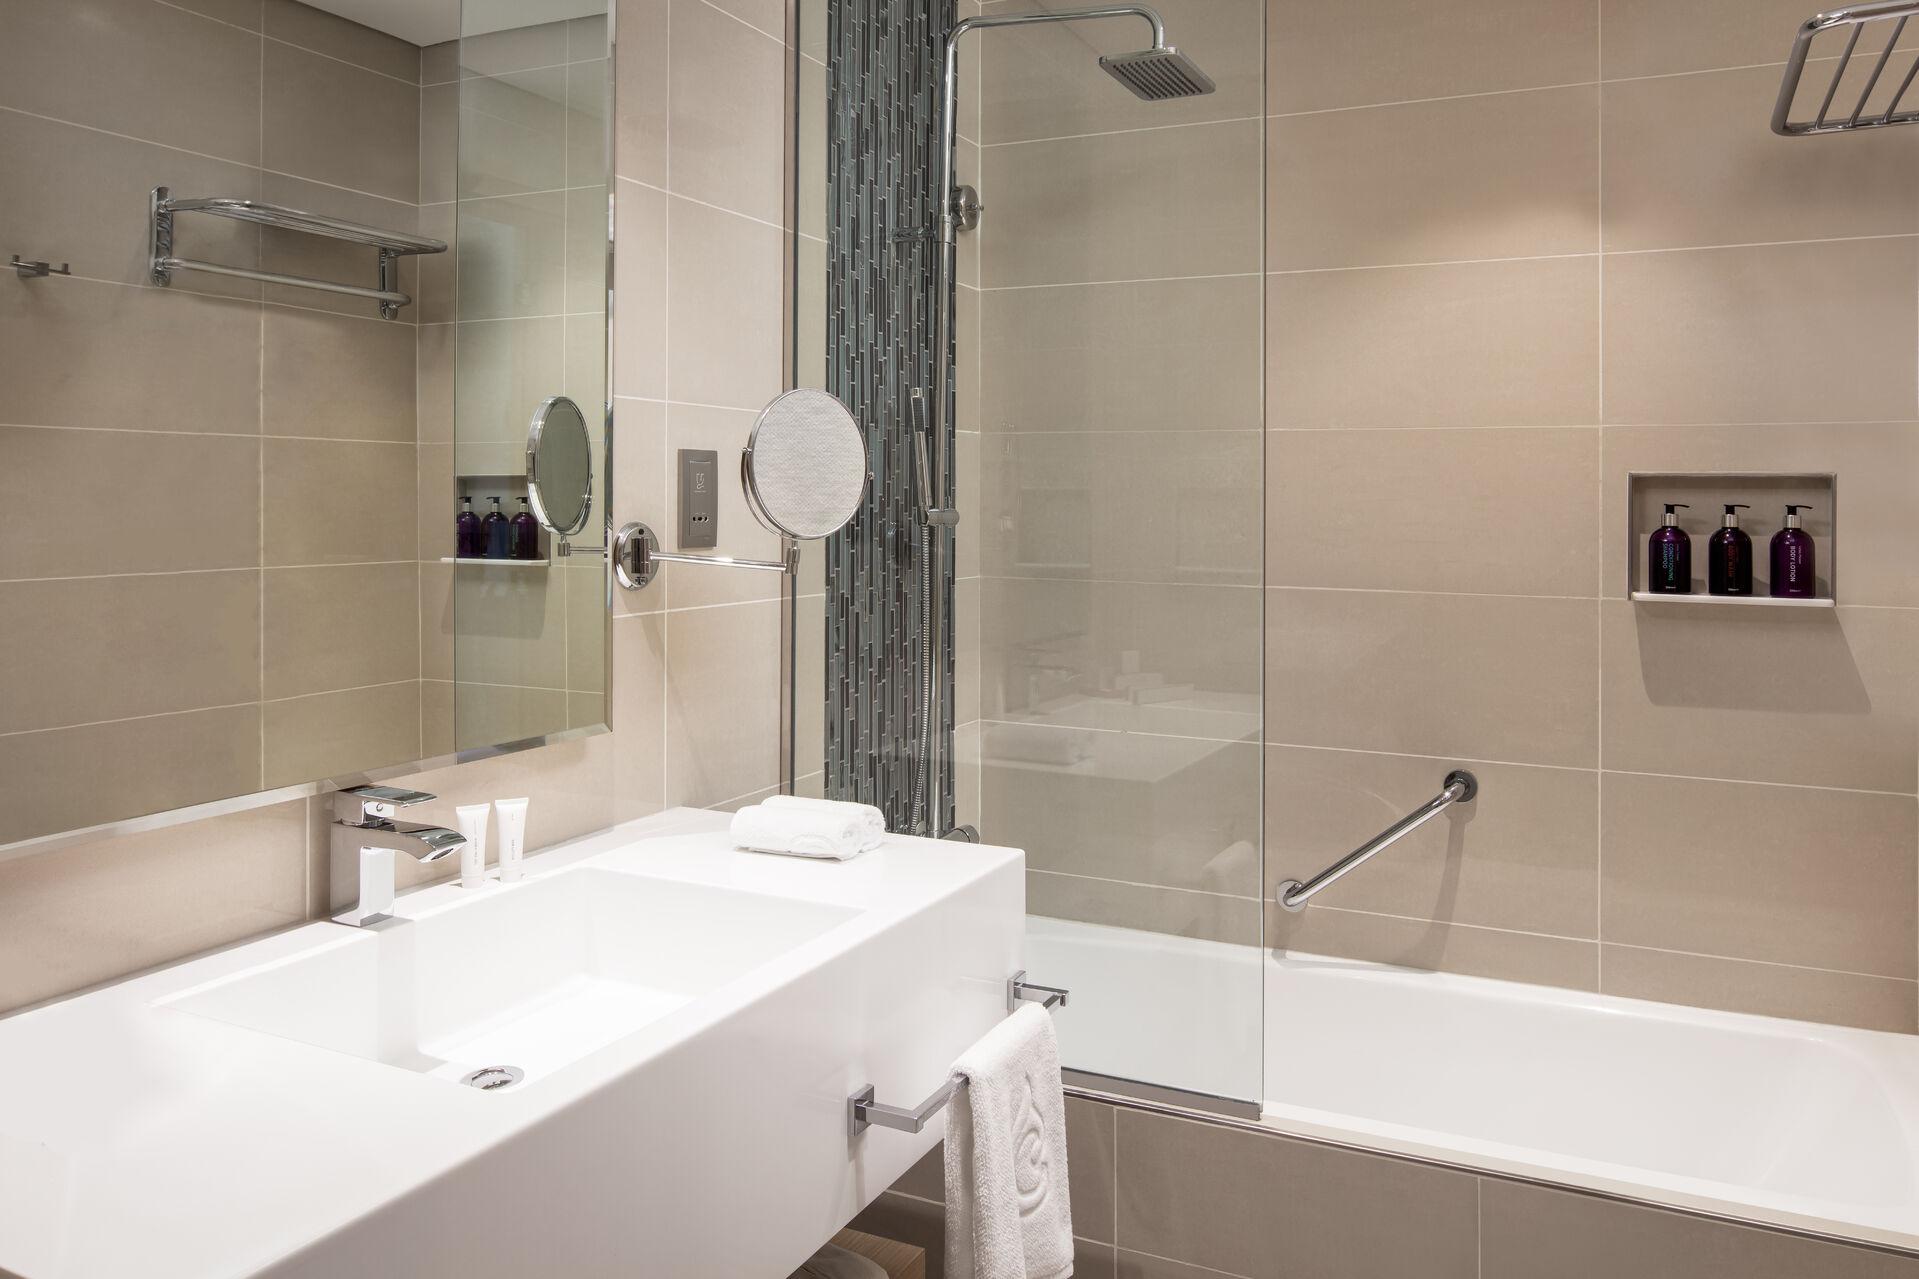 https://cms.satur.sk/data/imgs/tour_image/orig/cdd_dubai-01-superior-room-king-bathroom-2014021.jpg